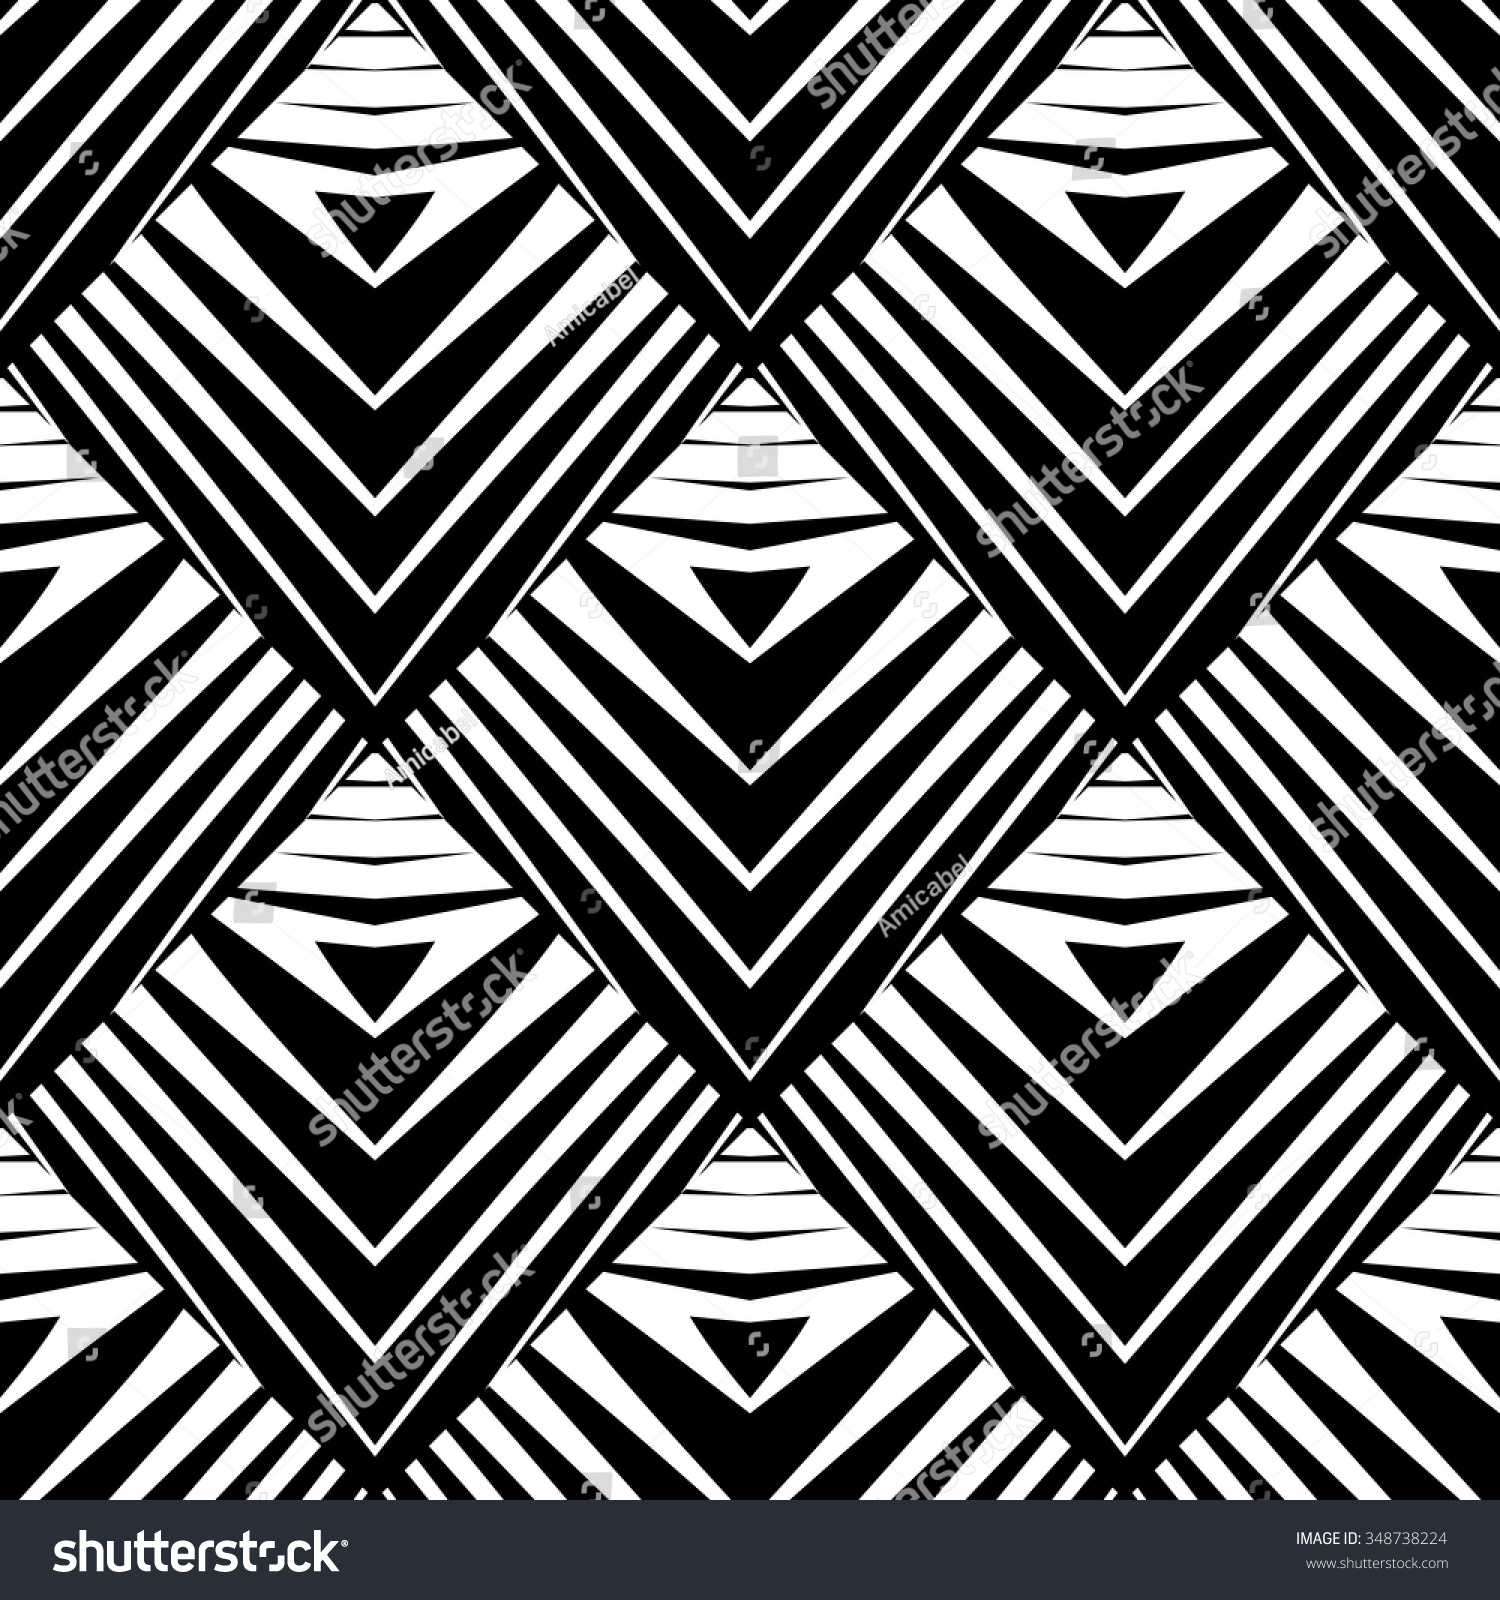 Design Seamless Diamond Pattern Abstract Geometric Stock ...